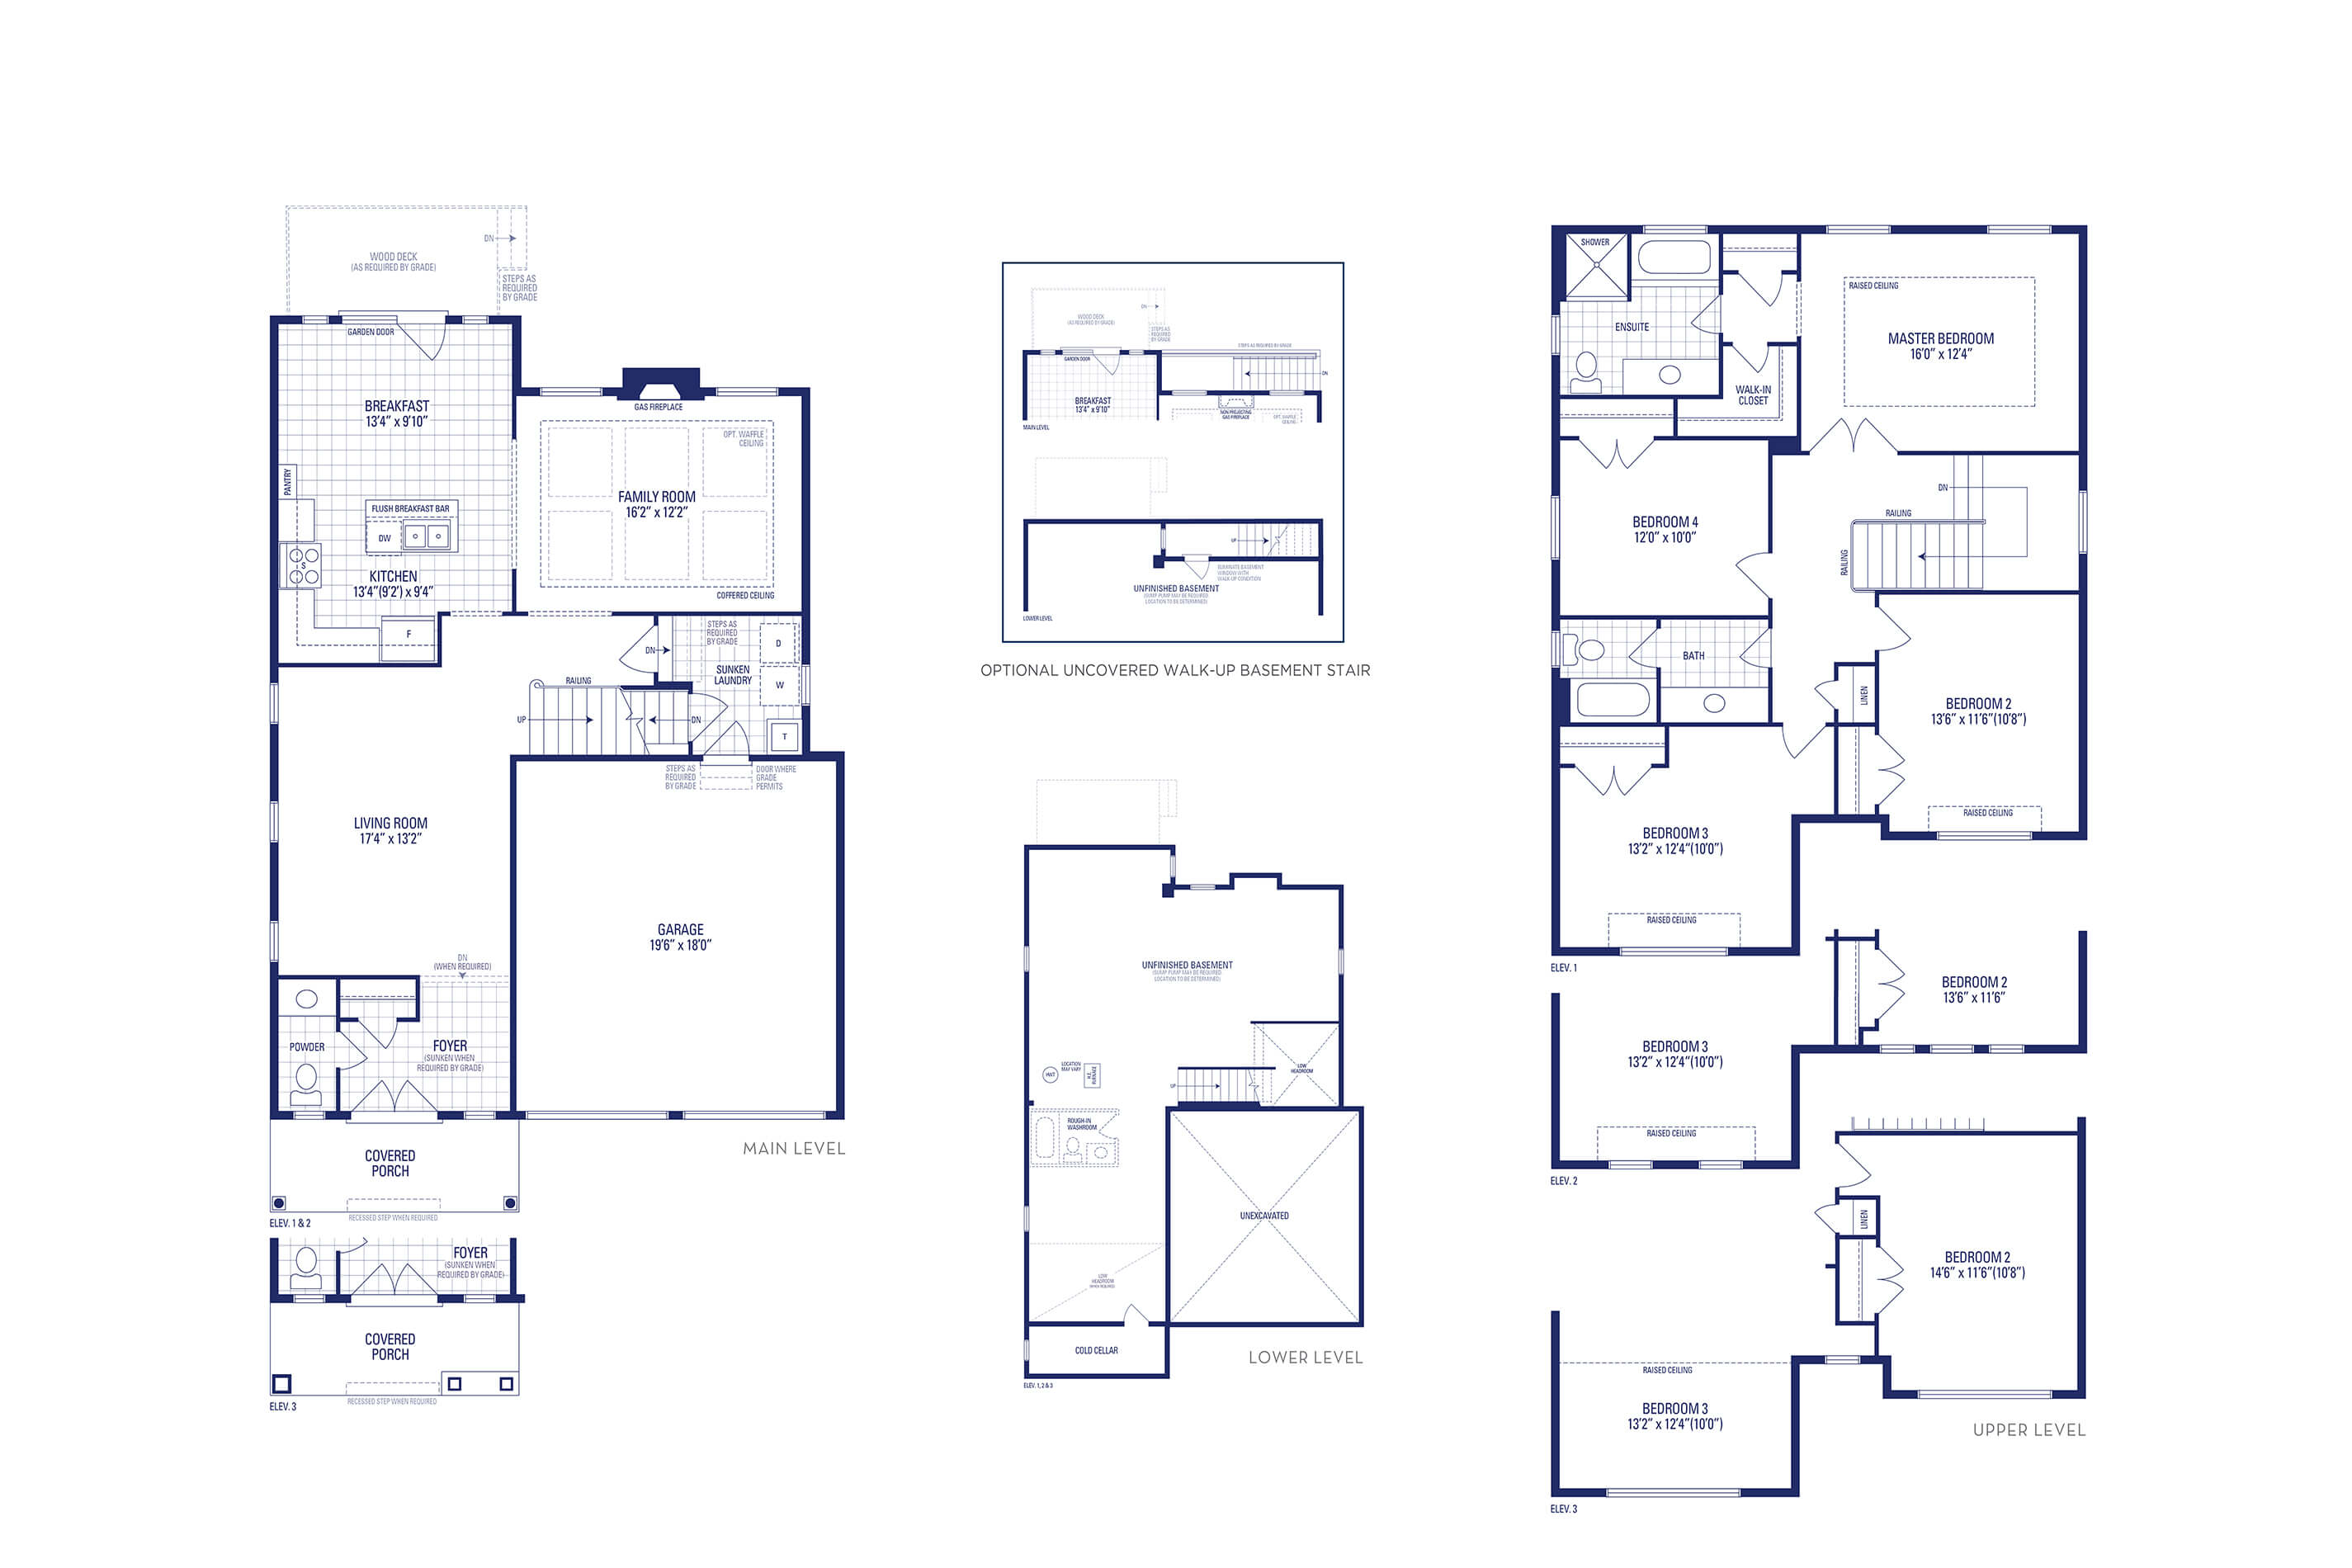 Lincoln 01 Elev. 1 Floorplan